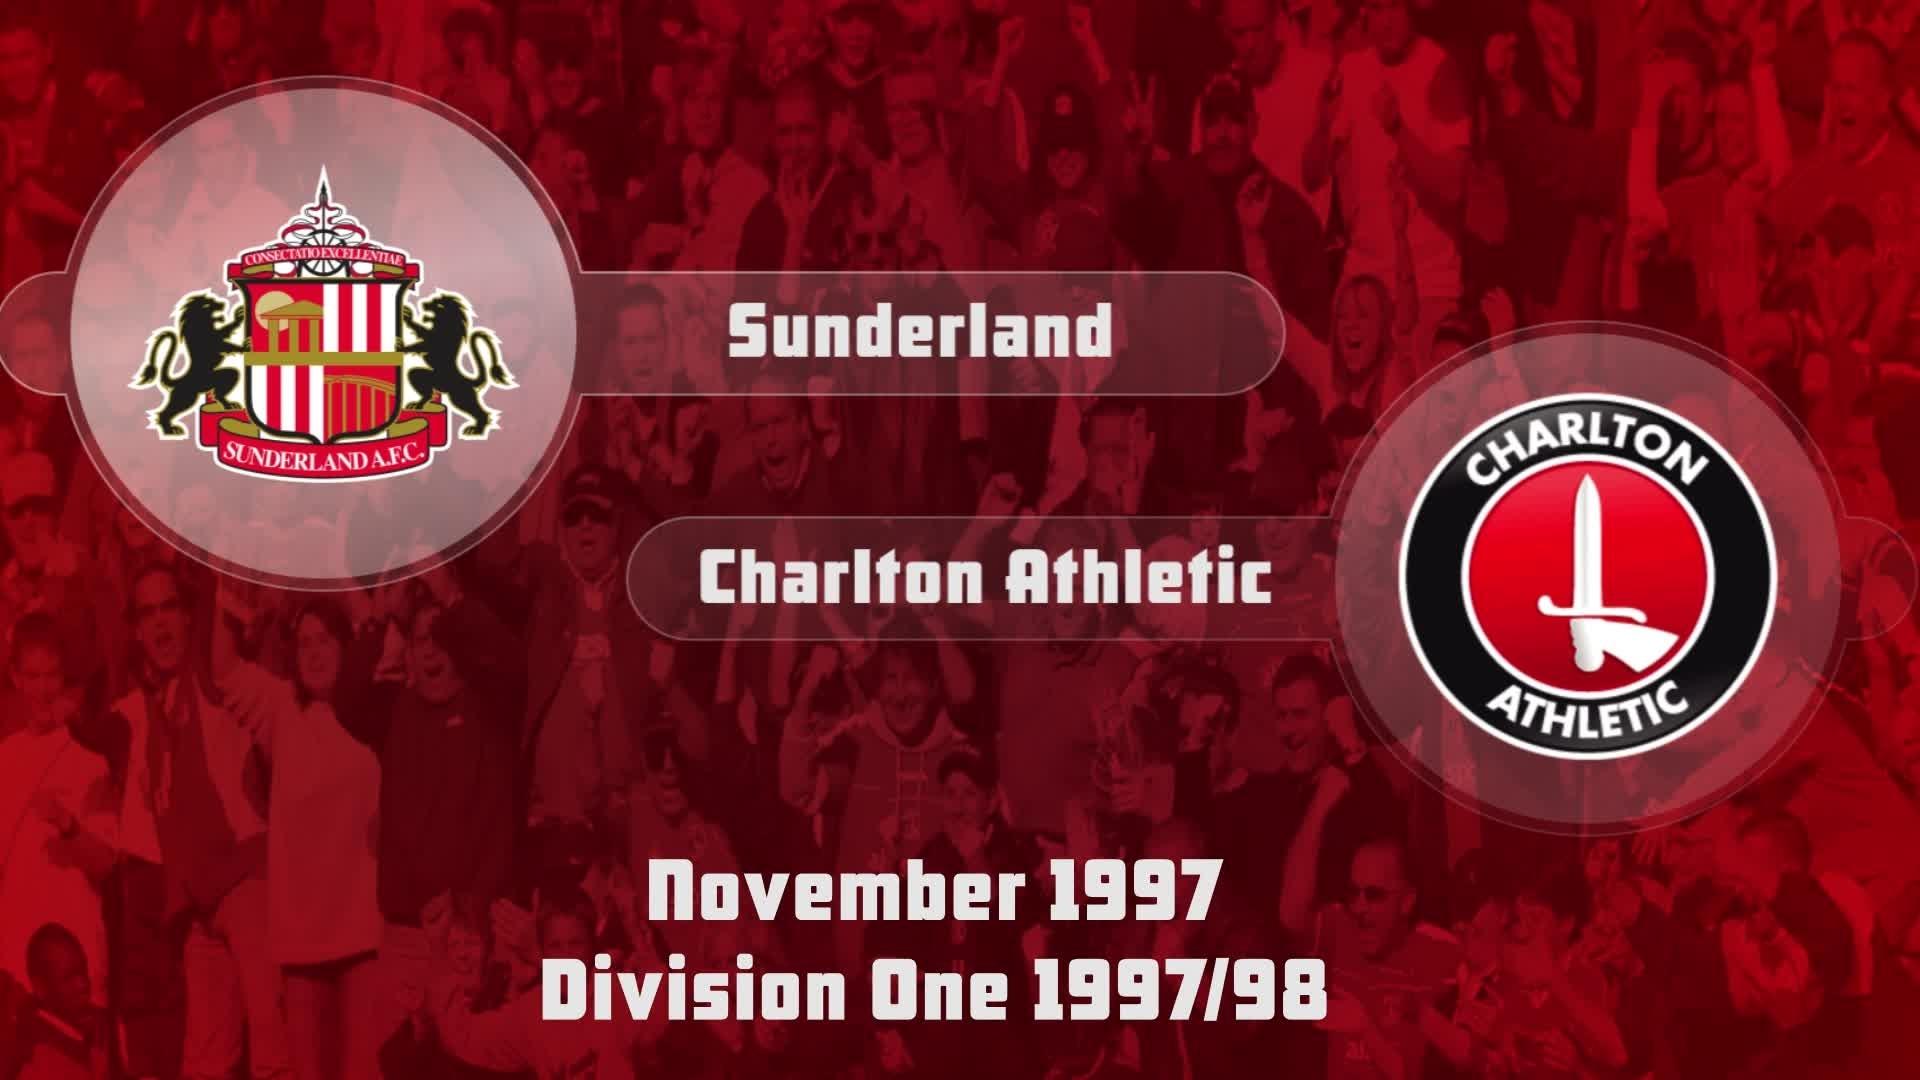 17 HIGHLIGHTS | Sunderland 0 Charlton 0 (Nov 1997)